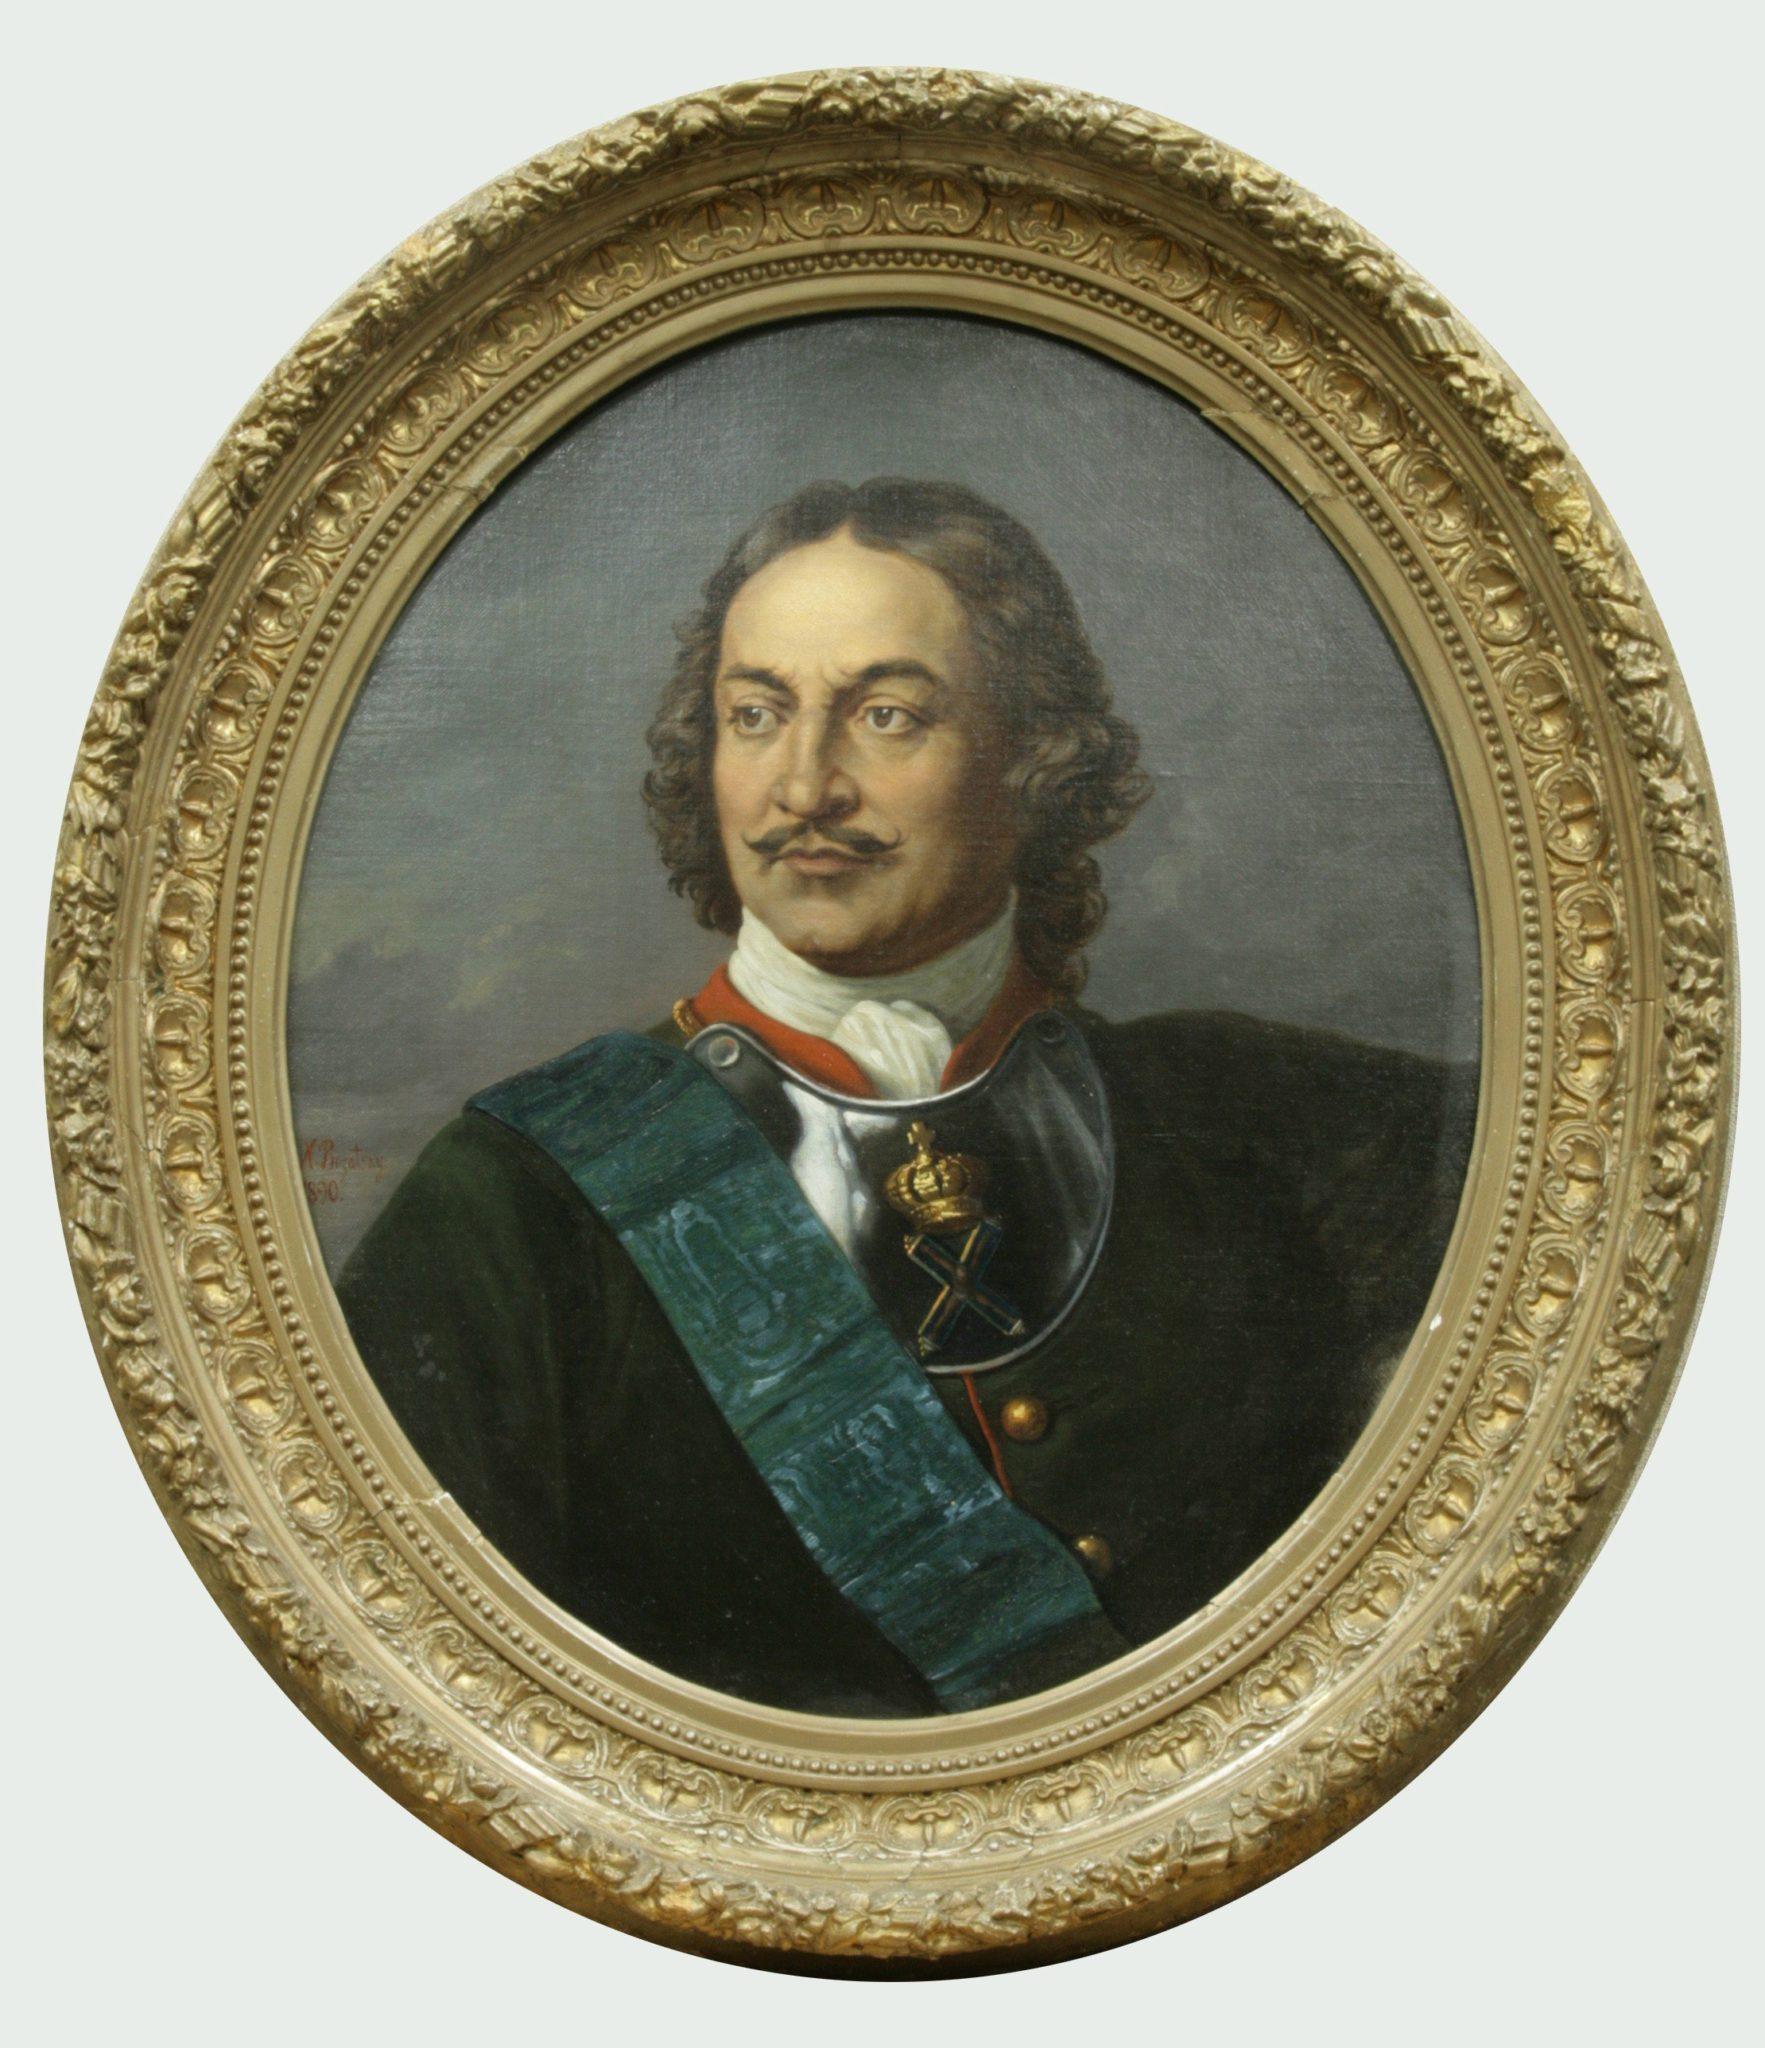 АОКМ КП – 519 Портрет Петра I Н.Т. Богацкий 1890 г.